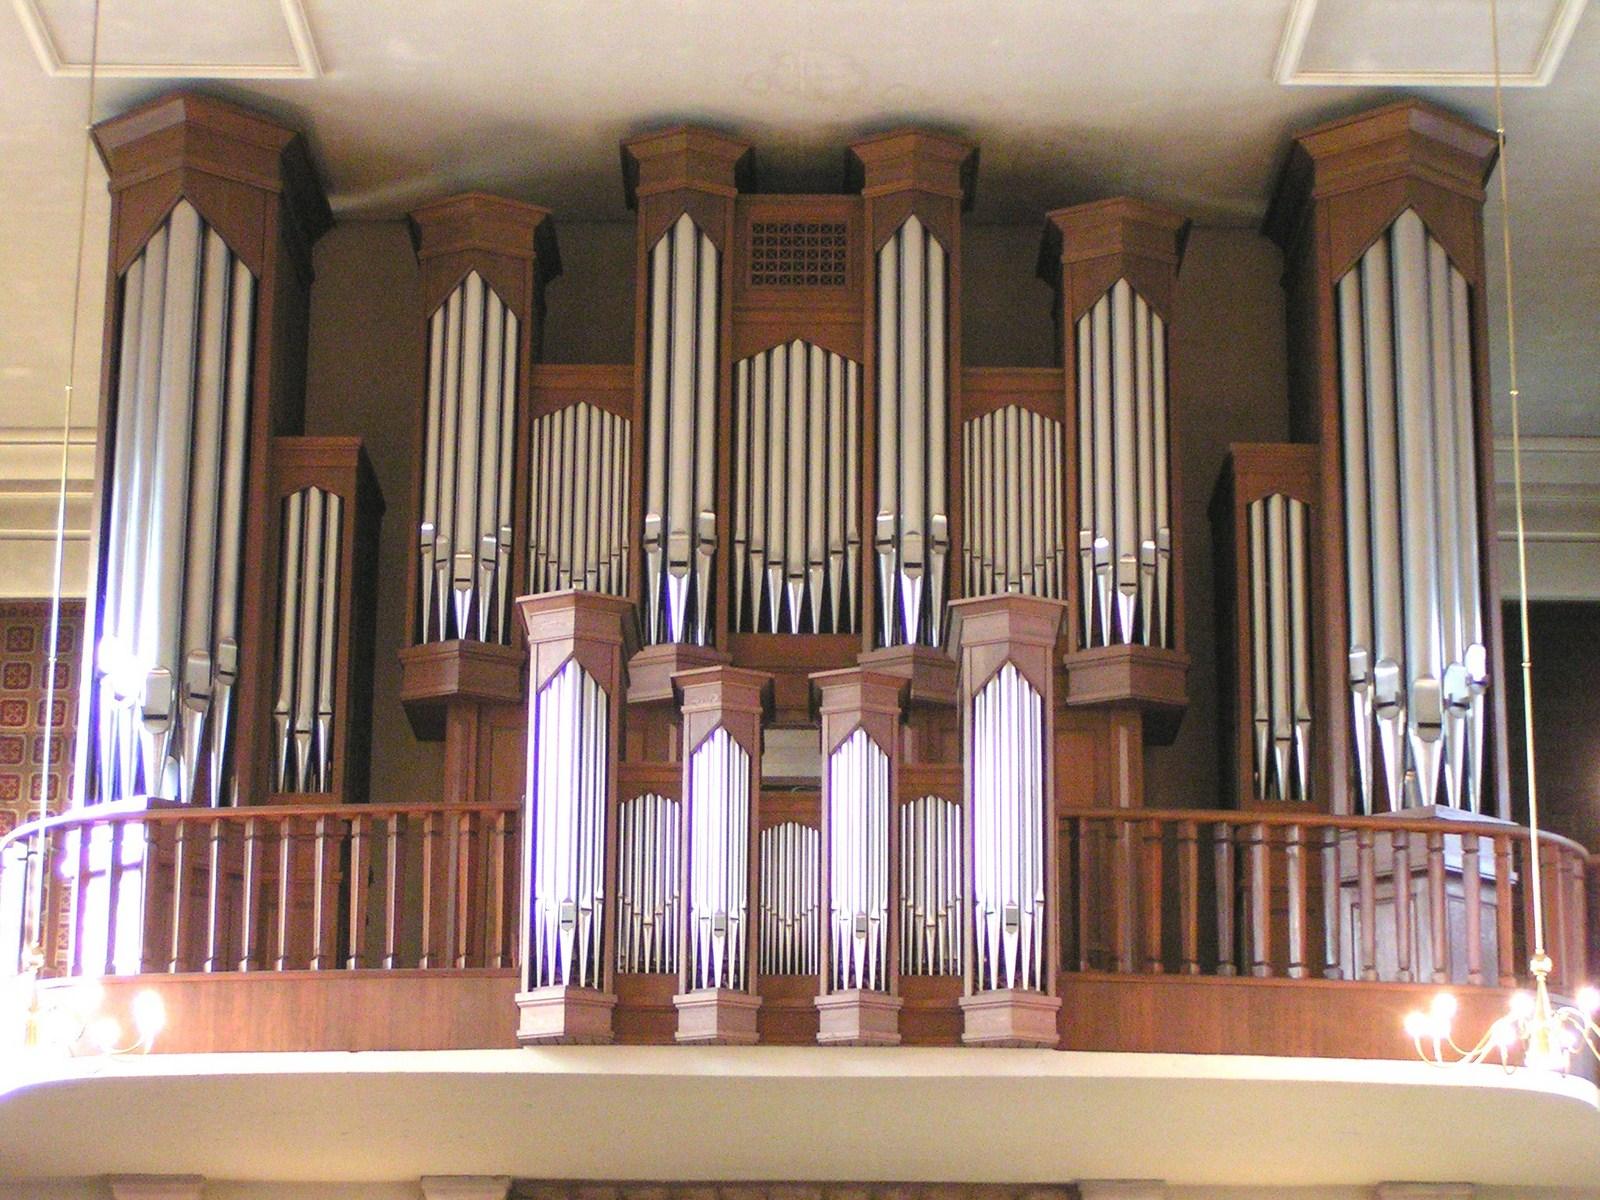 Festival d'orgues concert de Noël